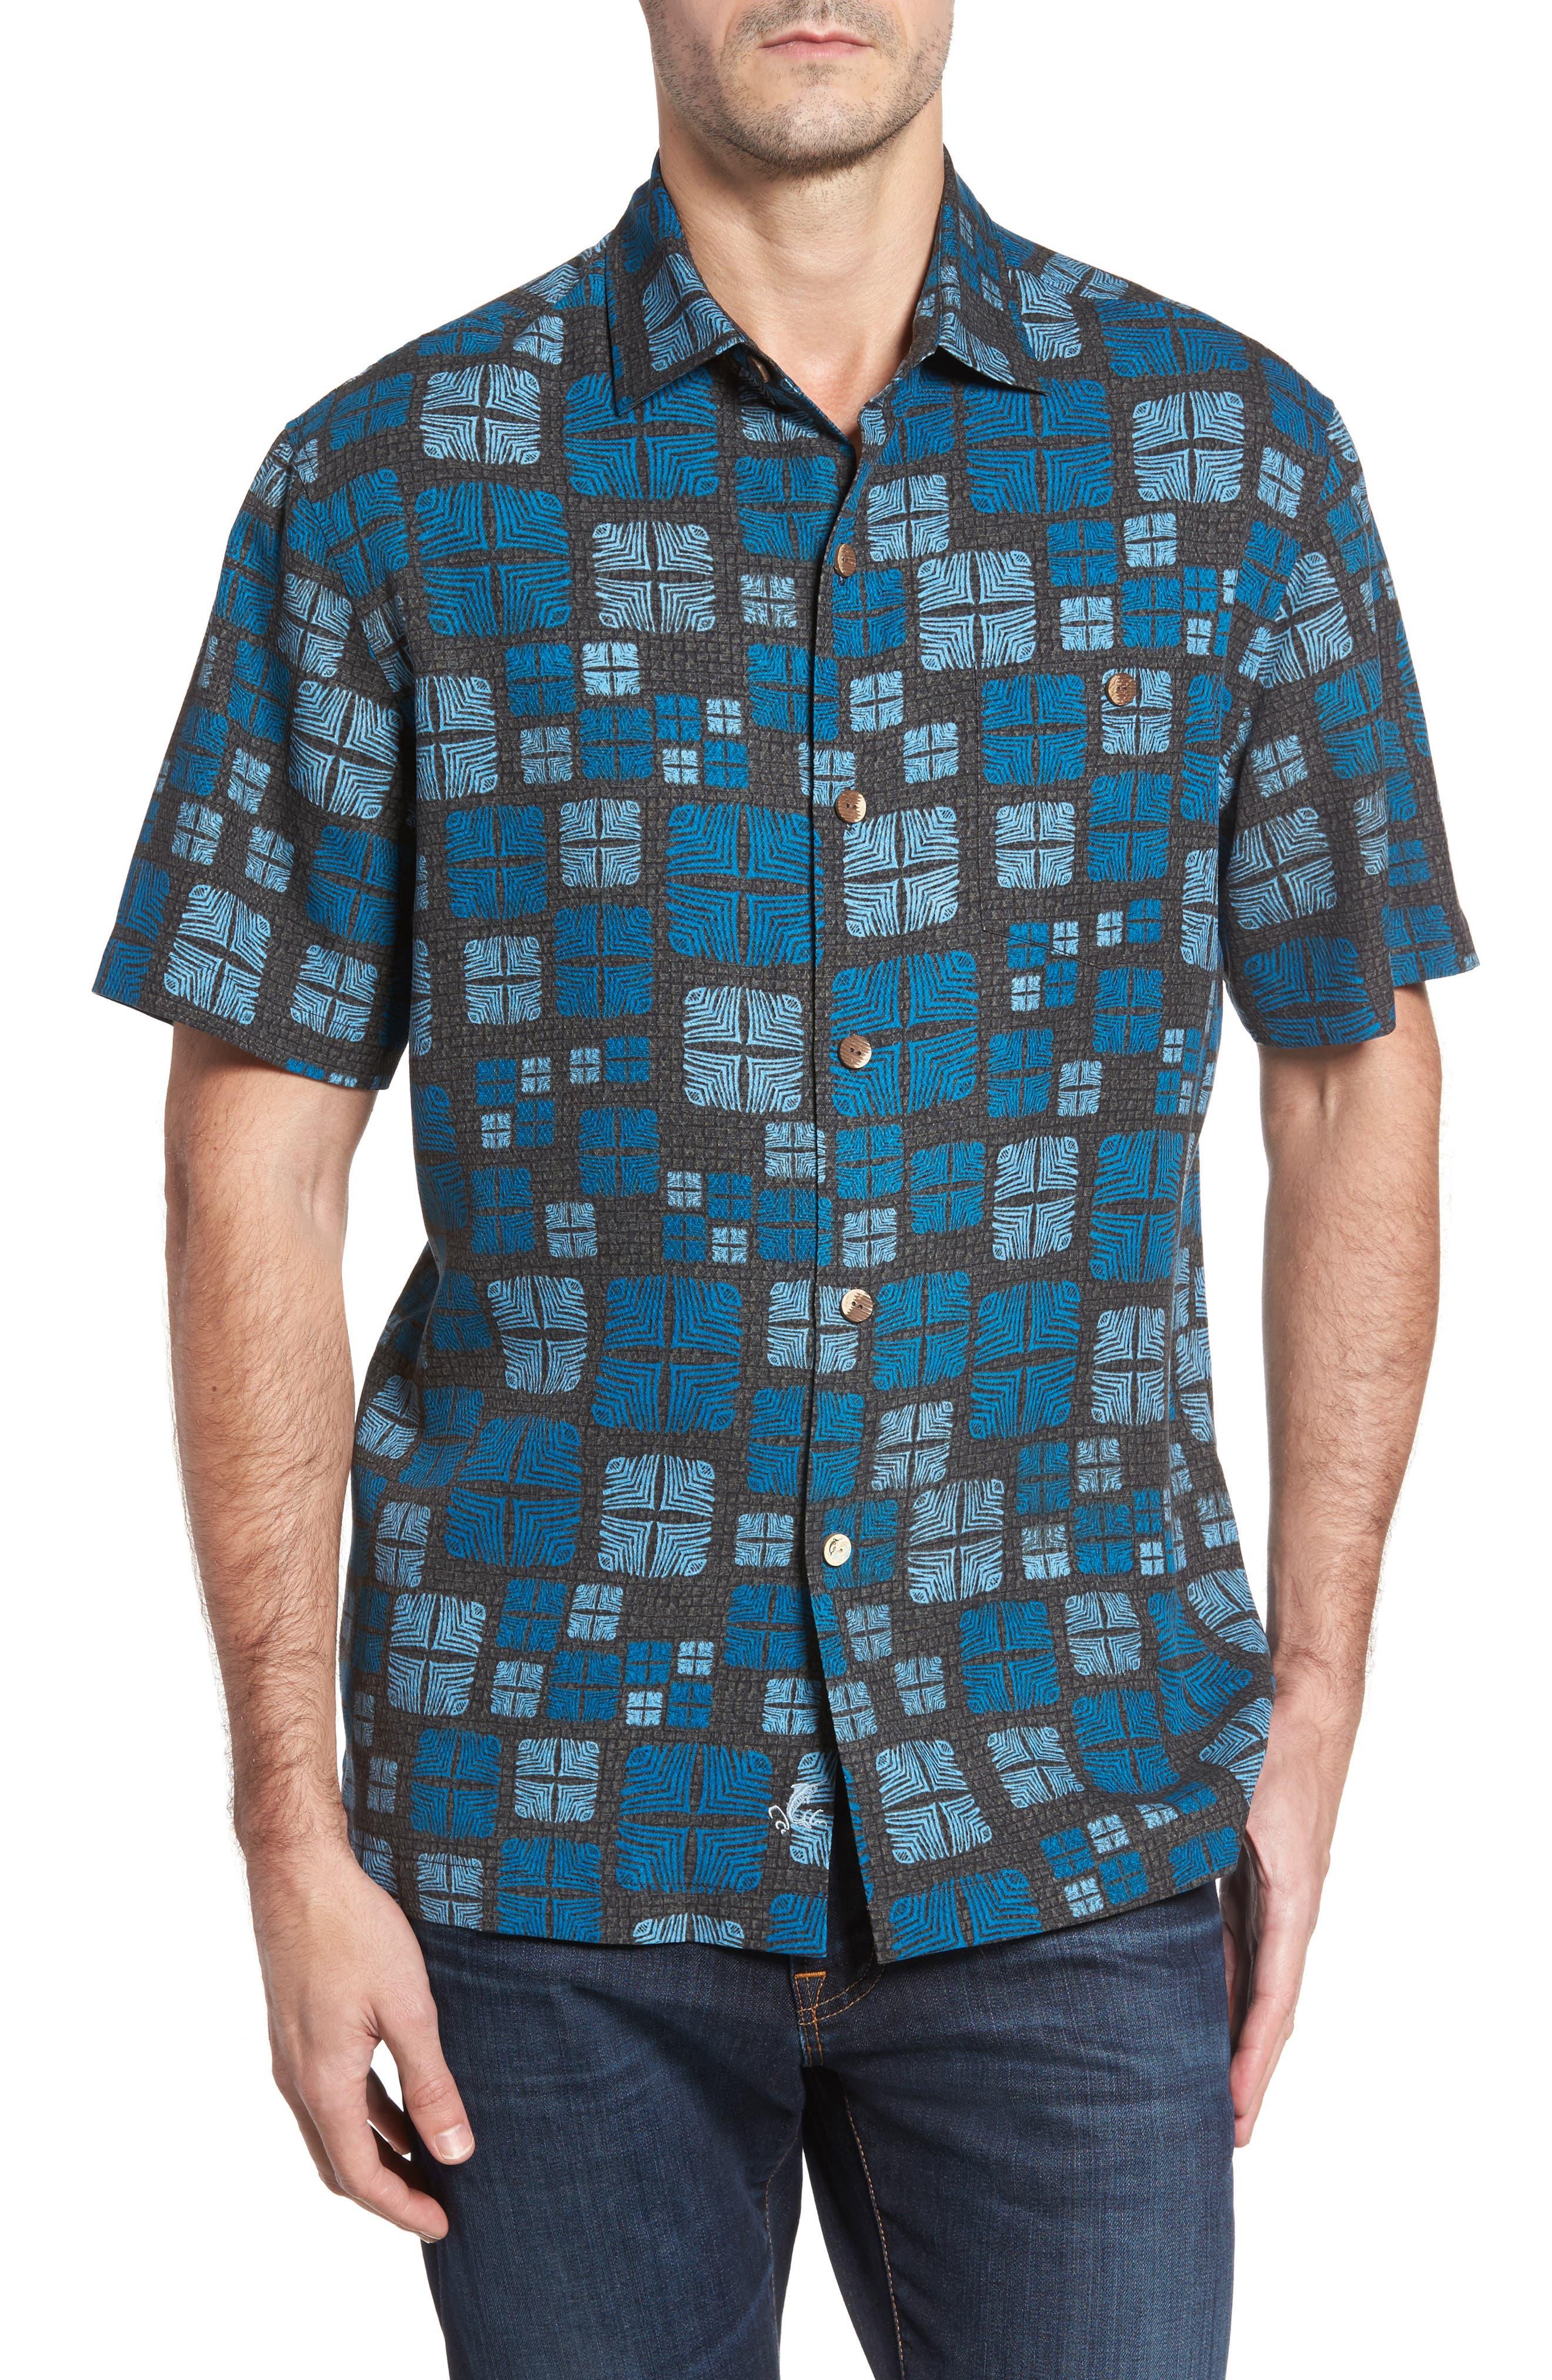 Alternate Image 1 Selected - Tommy Bahama Isla Tiles Standard Fit Silk Camp Shirt